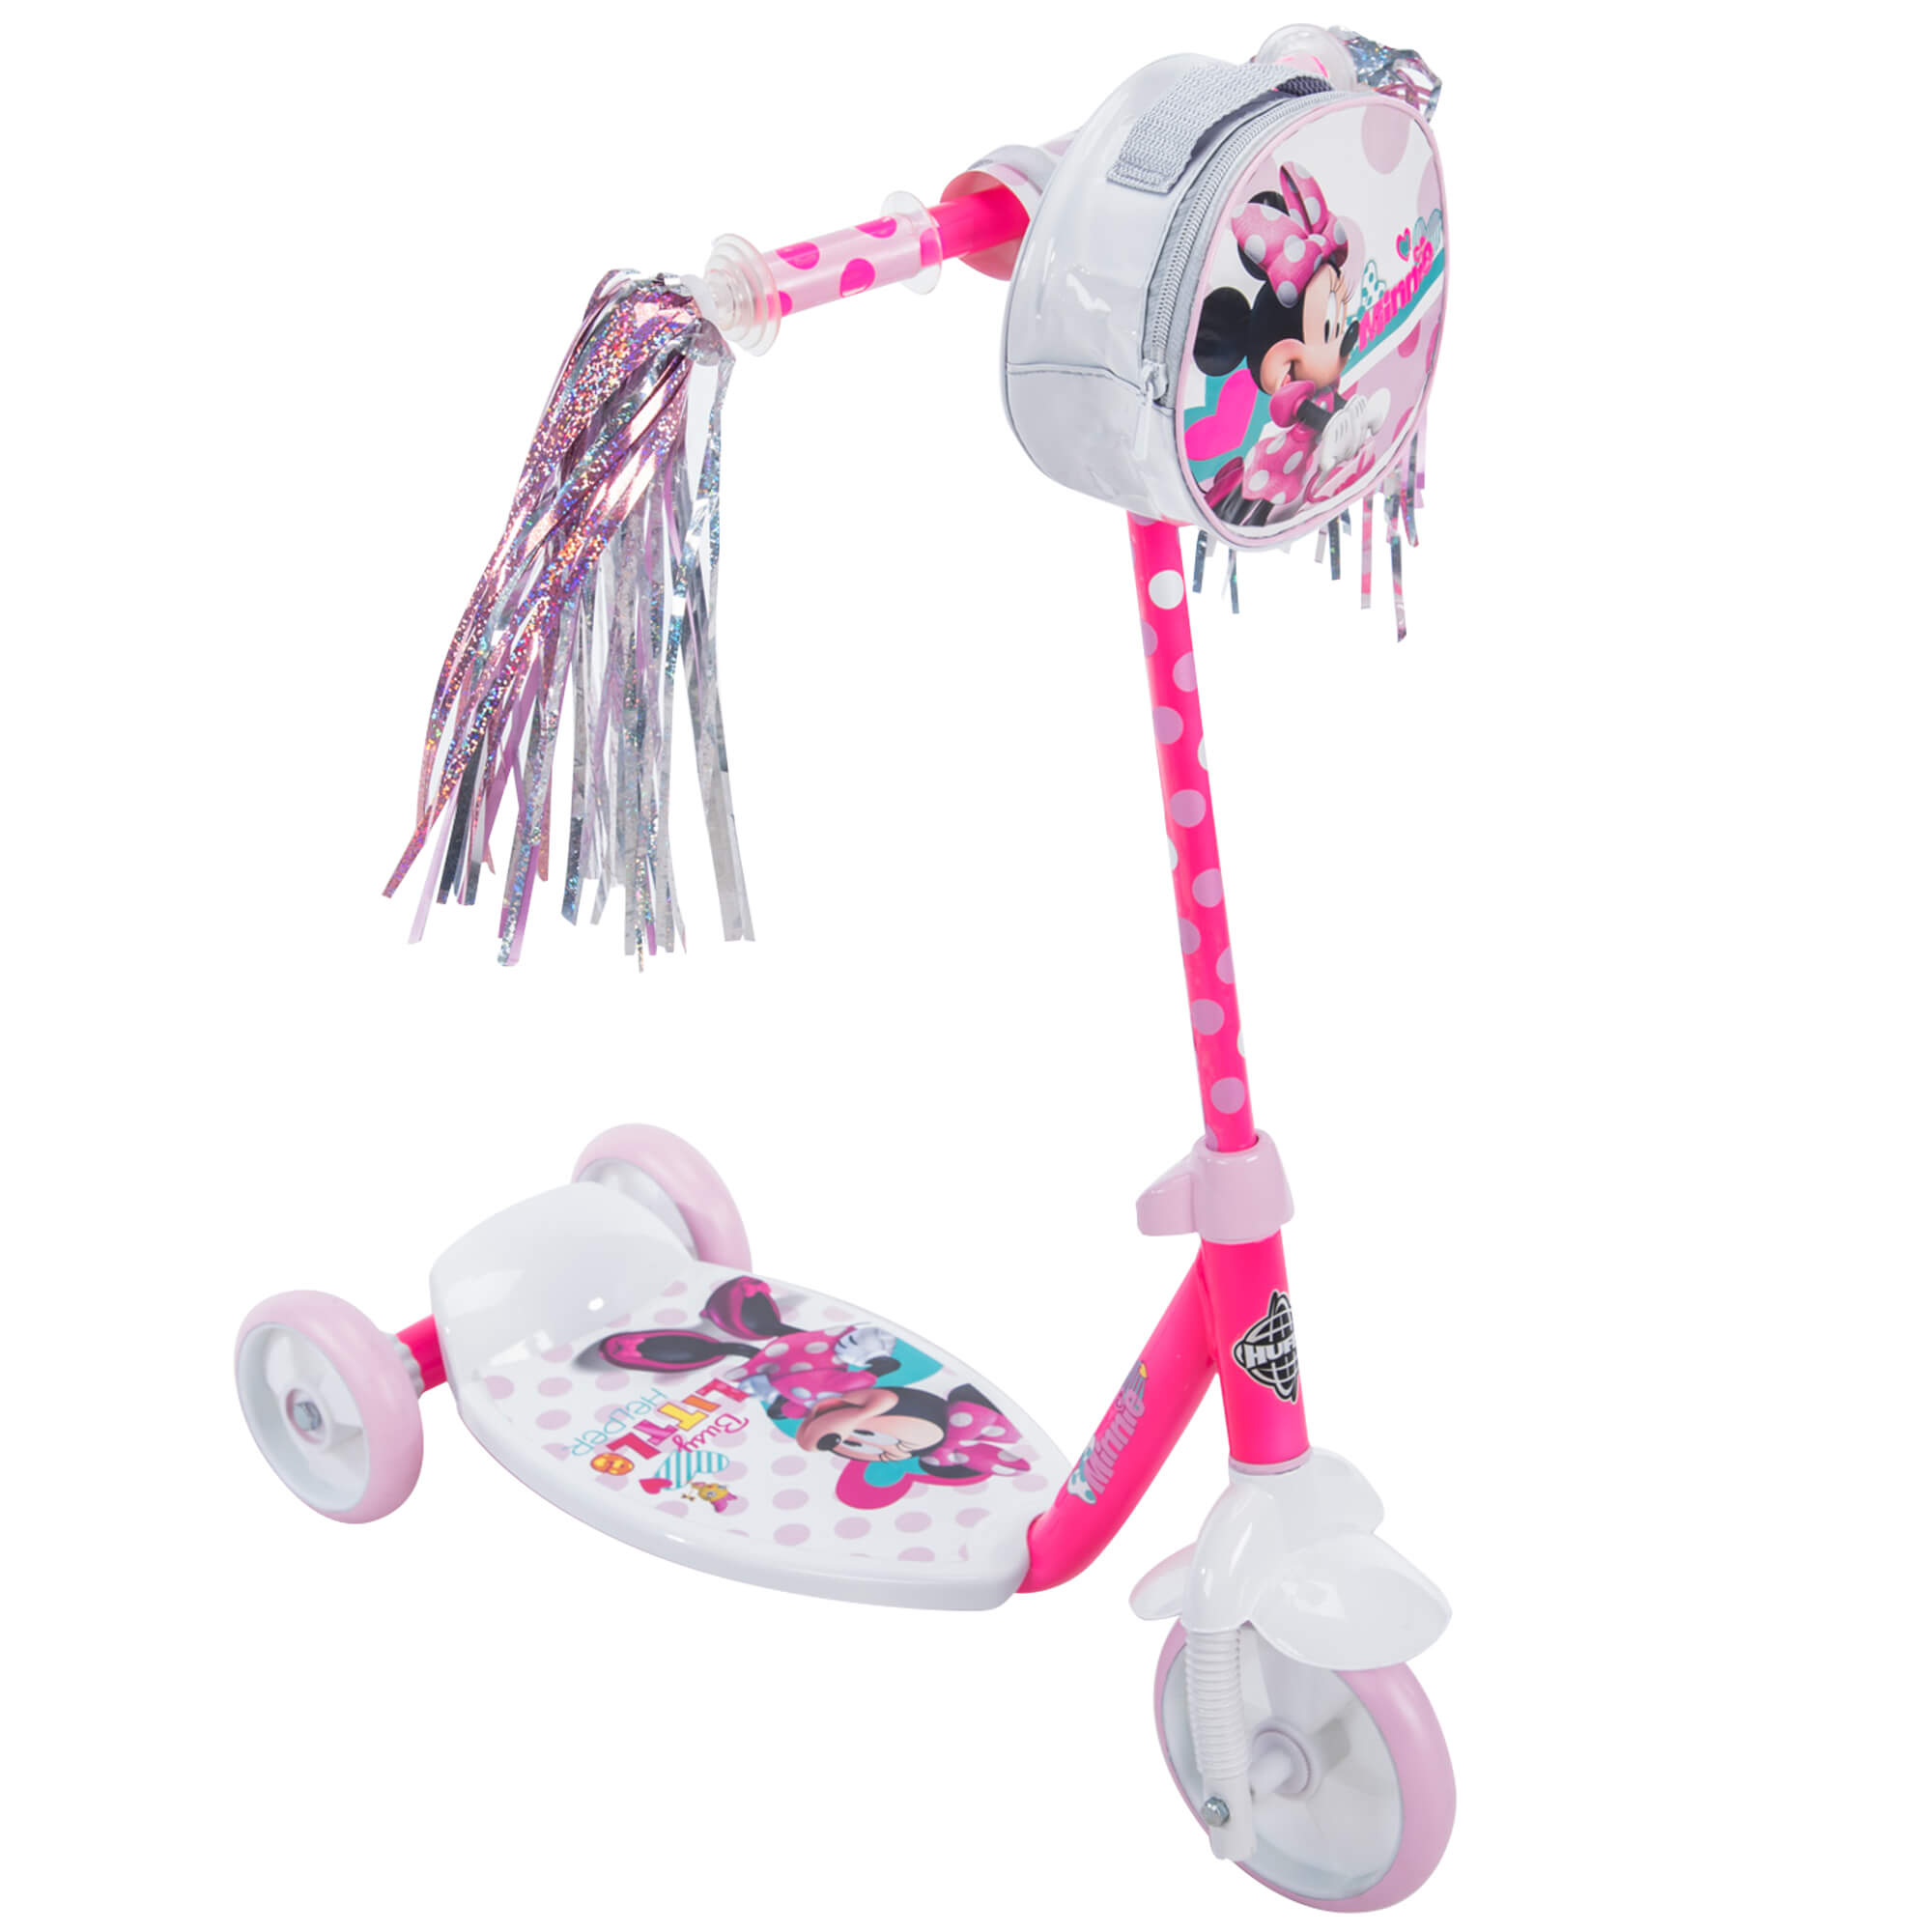 Disney Minnie Girls' 3-Wheel Pink Scooter, by Huffy